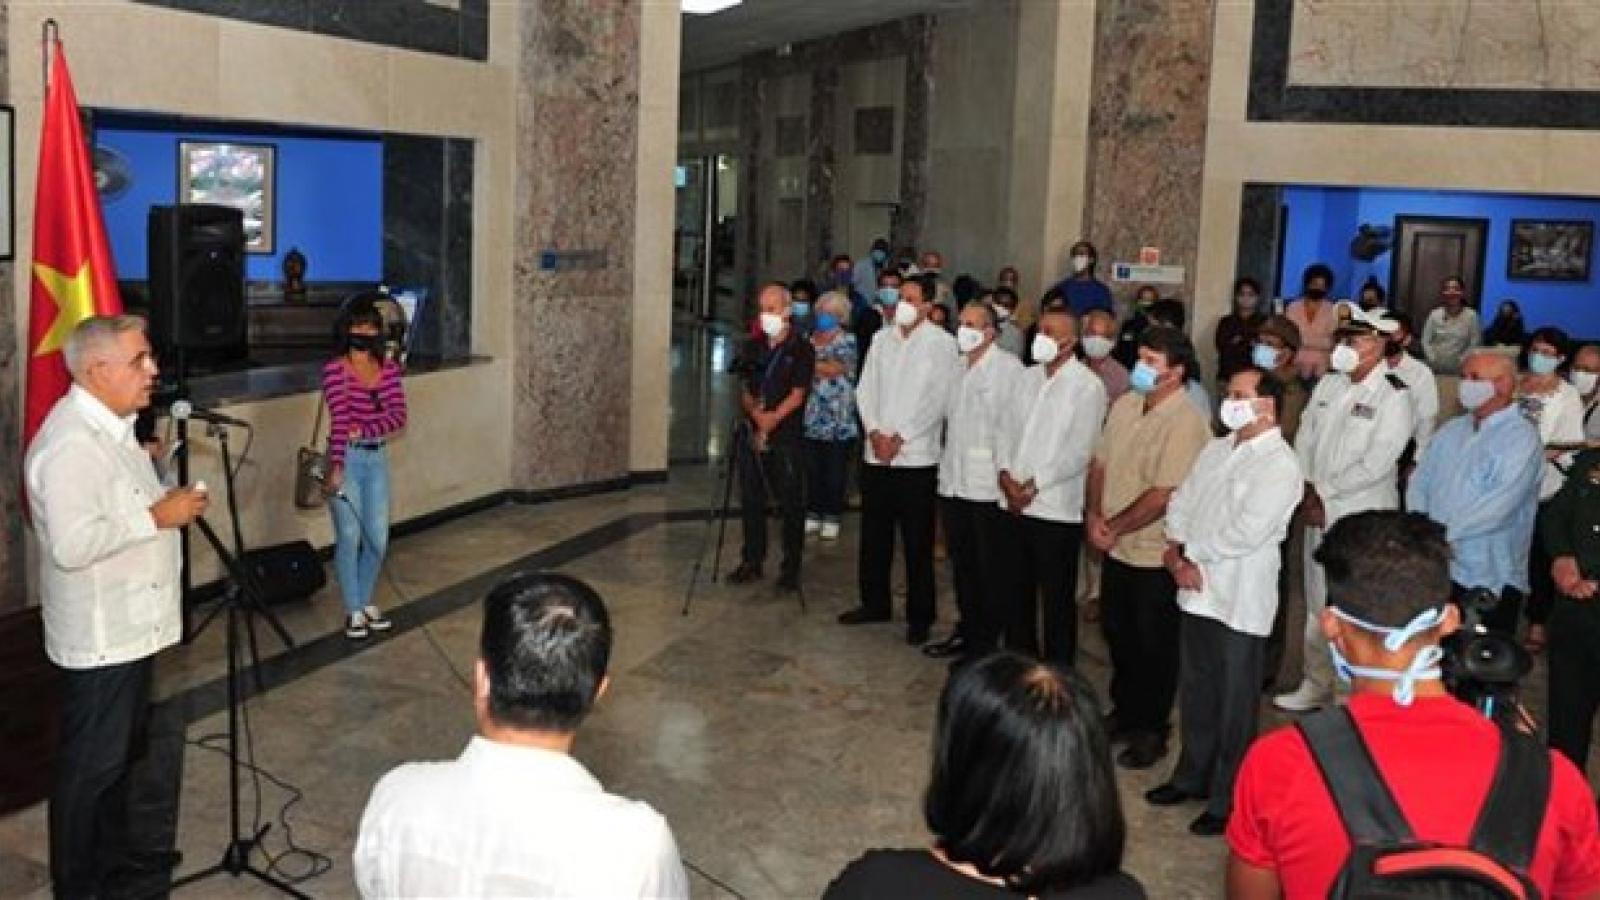 Havana photo exhibition marks 60 years of Vietnam-Cuba friendship